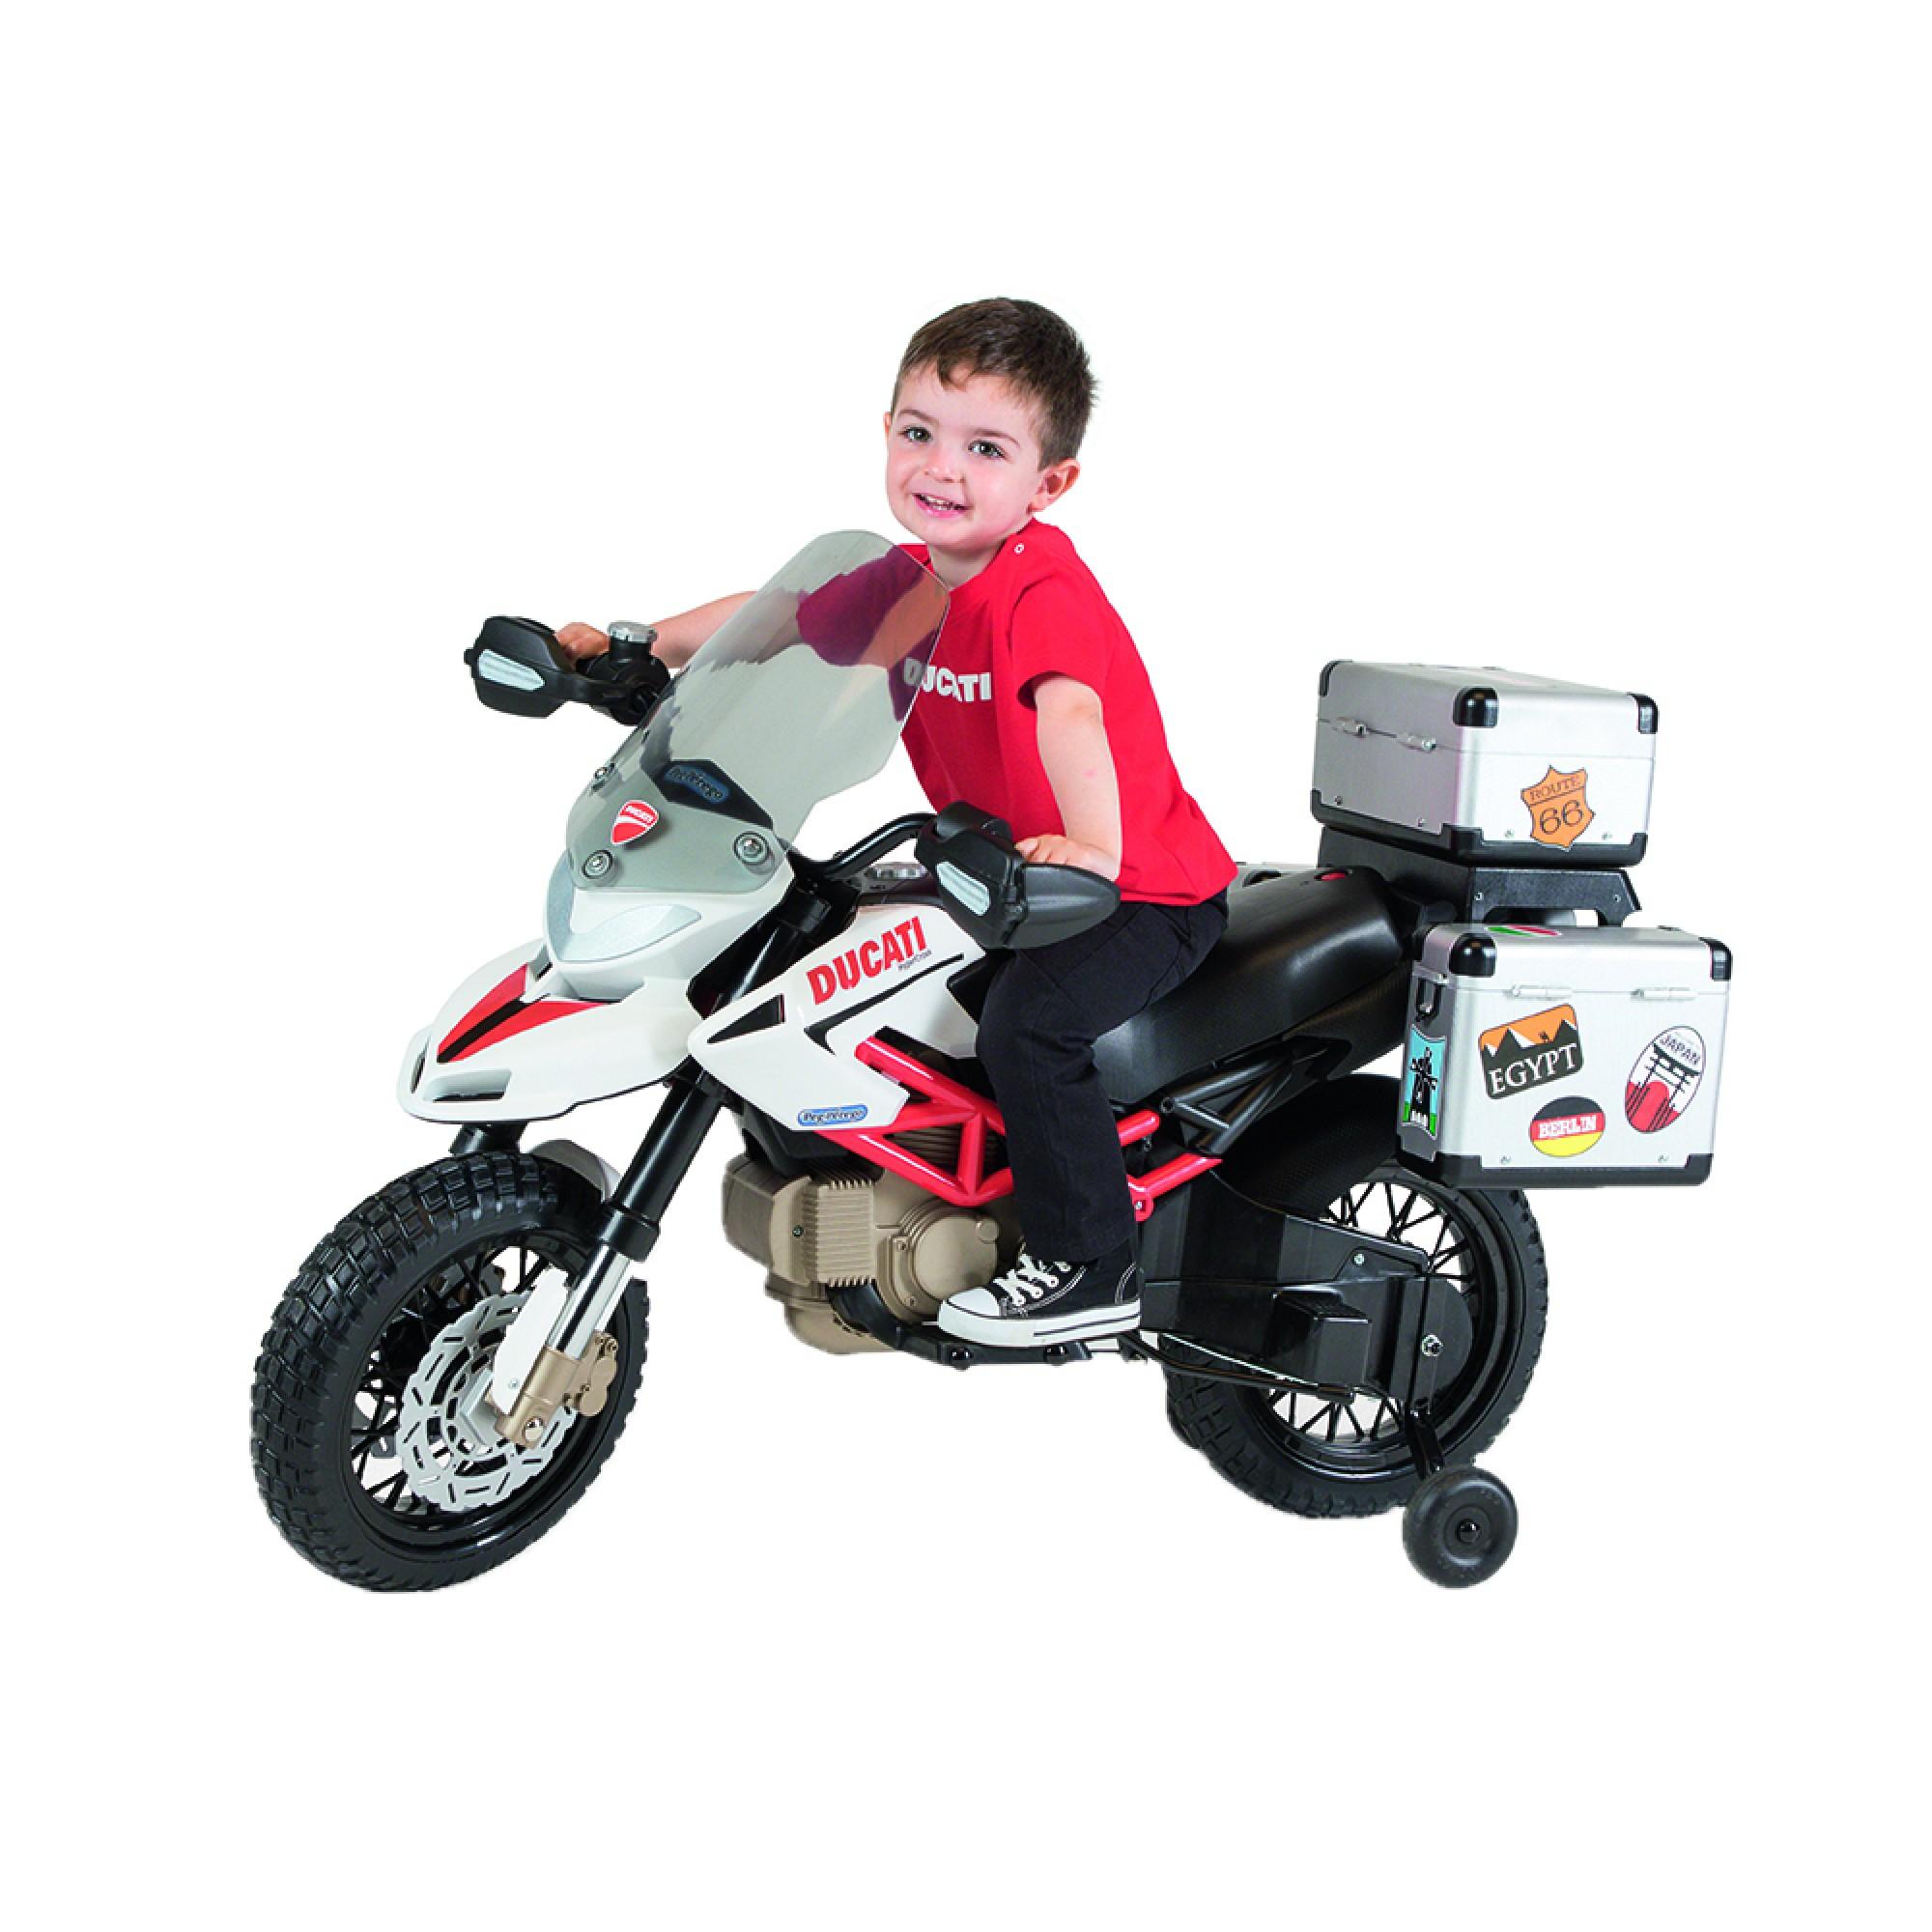 Motocicleta, Ducati HyperCross, Peg Perego